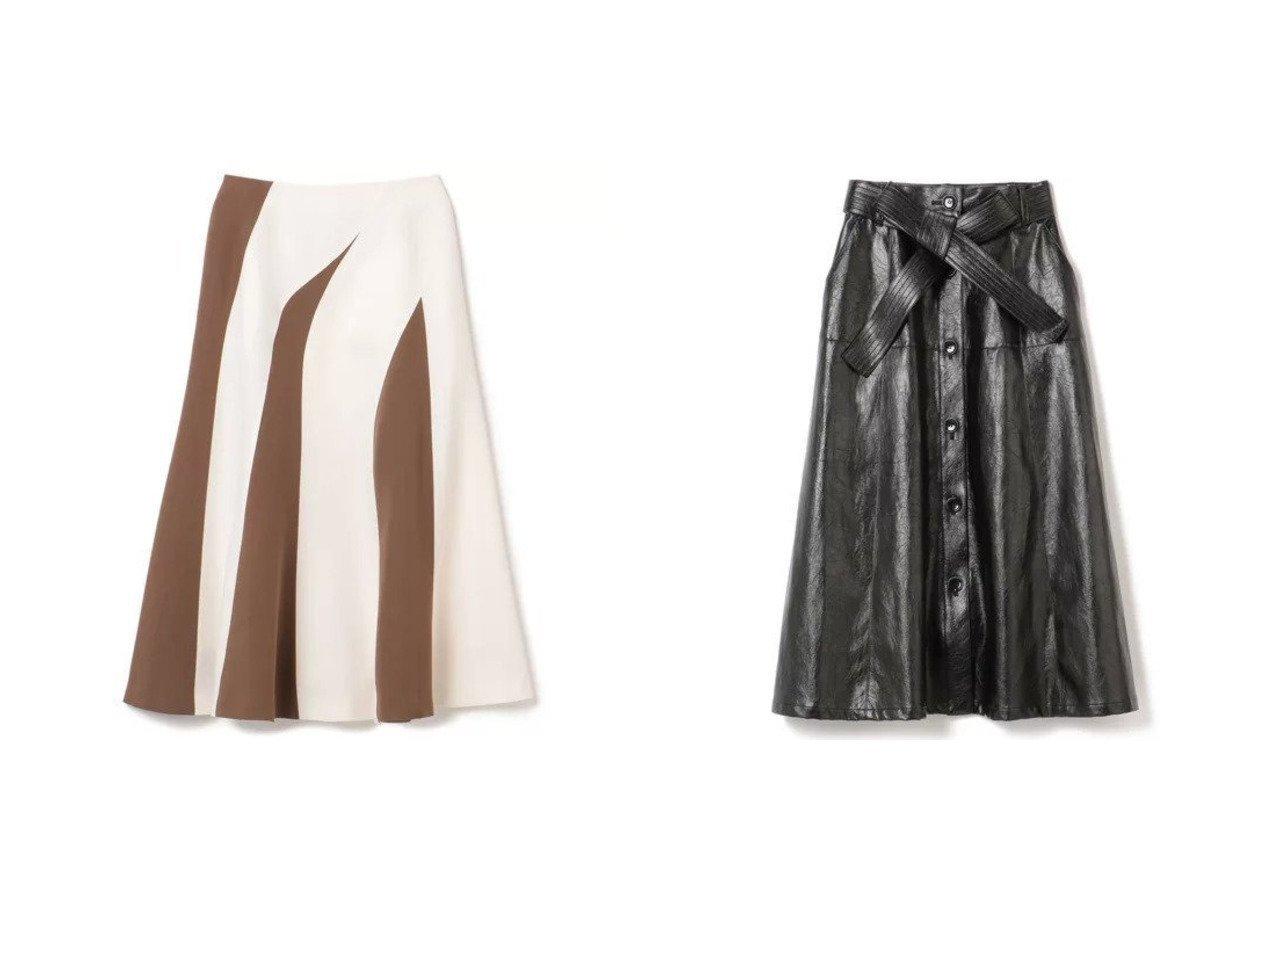 【AKIRANAKA/アキラナカ】のMoira two-tone panel skirt&Earlene faux leather skirt スカートのおすすめ!人気、レディースファッションの通販  おすすめで人気のファッション通販商品 インテリア・家具・キッズファッション・メンズファッション・レディースファッション・服の通販 founy(ファニー) https://founy.com/ ファッション Fashion レディース WOMEN スカート Skirt アシンメトリー フロント プリーツ マキシ ロング 冬 Winter スタイリッシュ リボン |ID:crp329100000004072